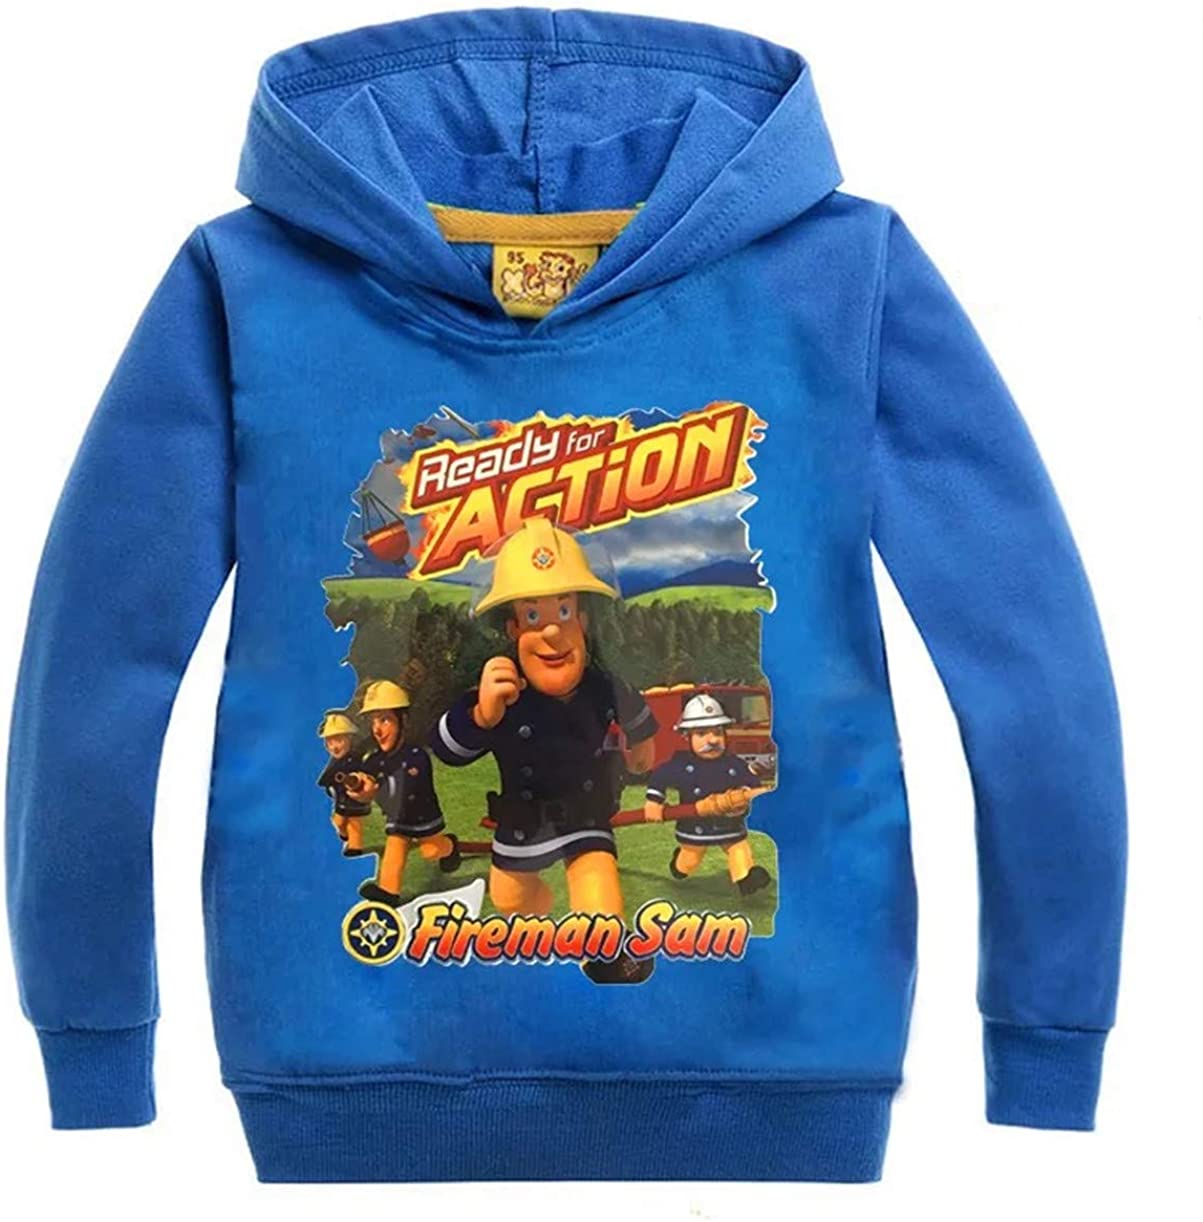 2T-14 Years Gin-back Boys Fireman Sam Graphic Hoodie-Kids Casual Long Sleeve Hooded Sweatshirt in 20 Colors